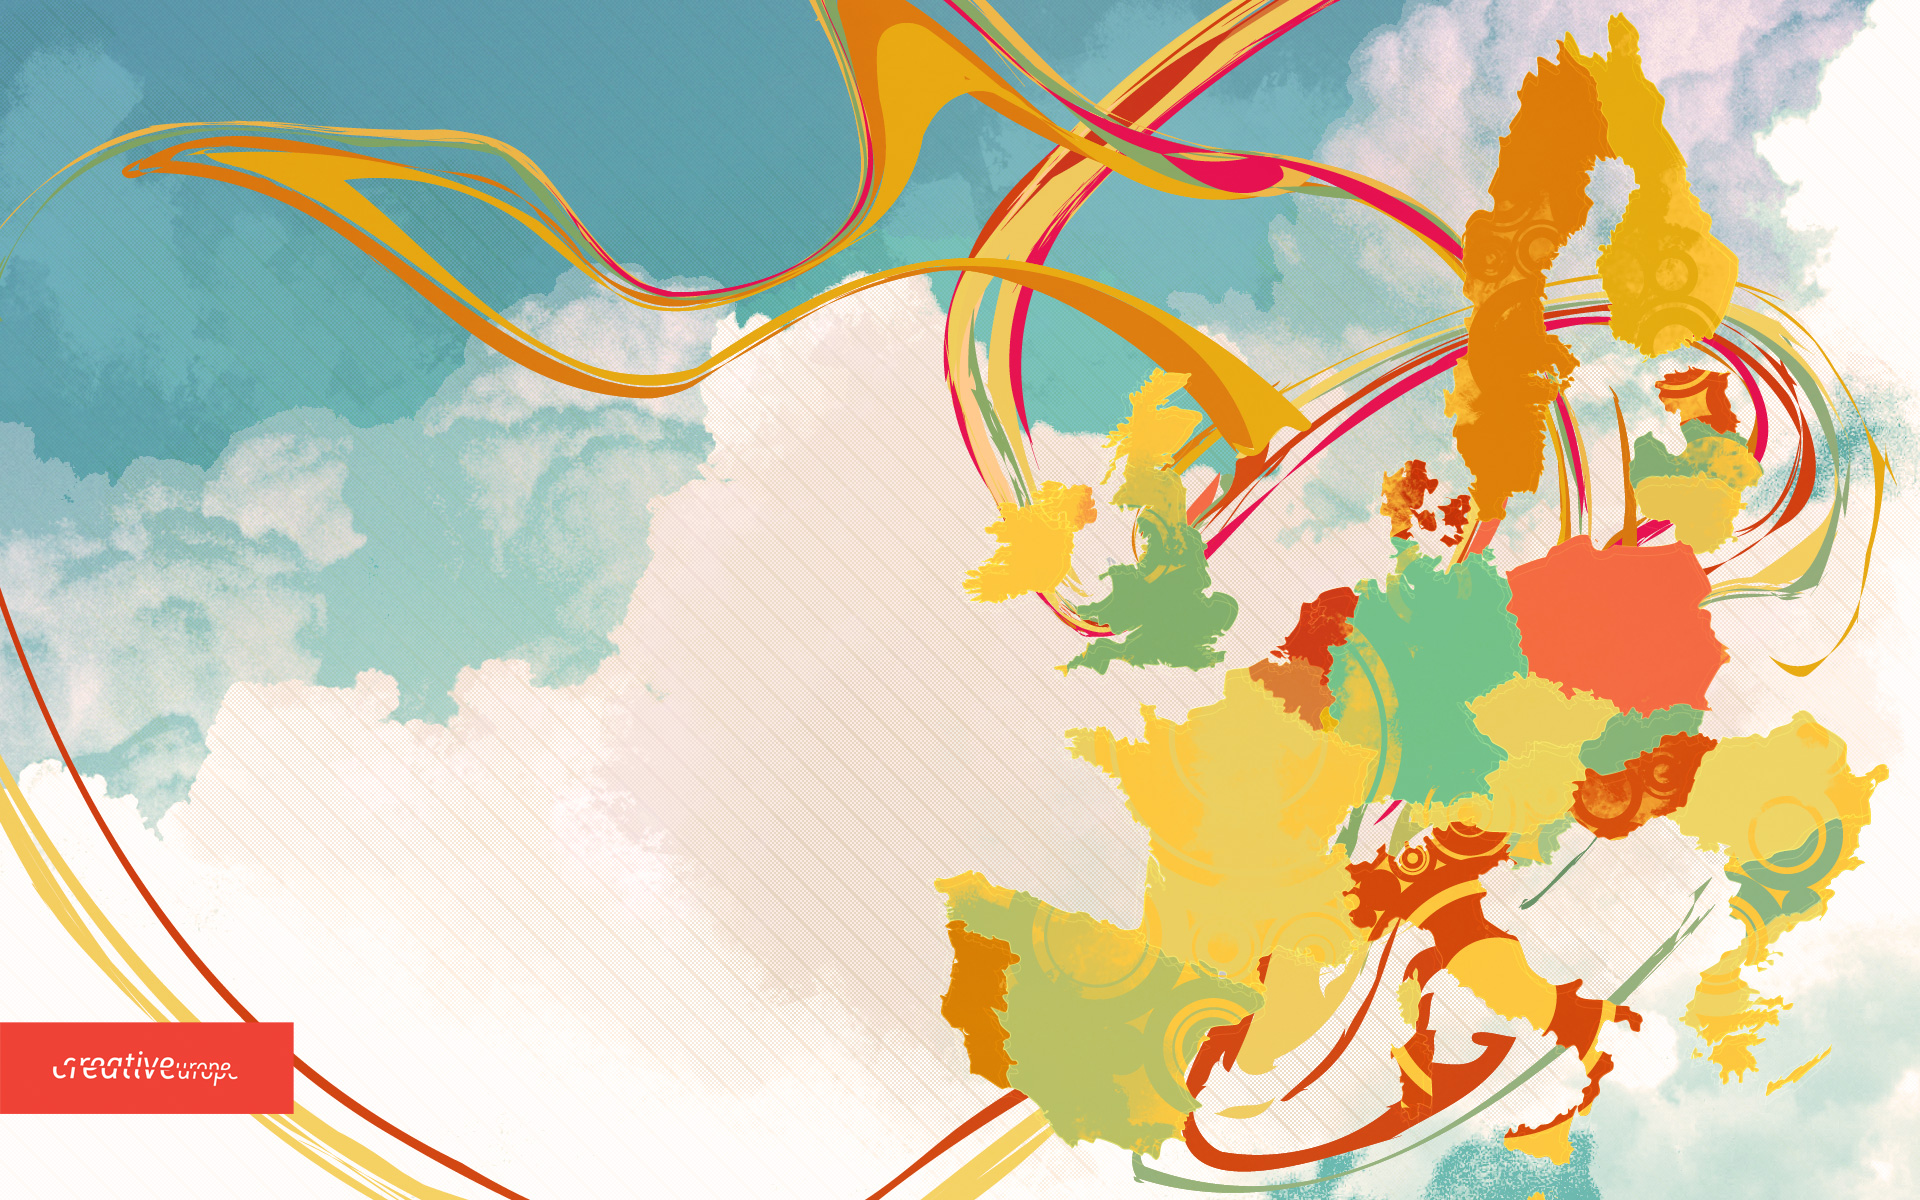 Photo Collection U Smap Desktop Wallpaper - Us map desktop wallpaper